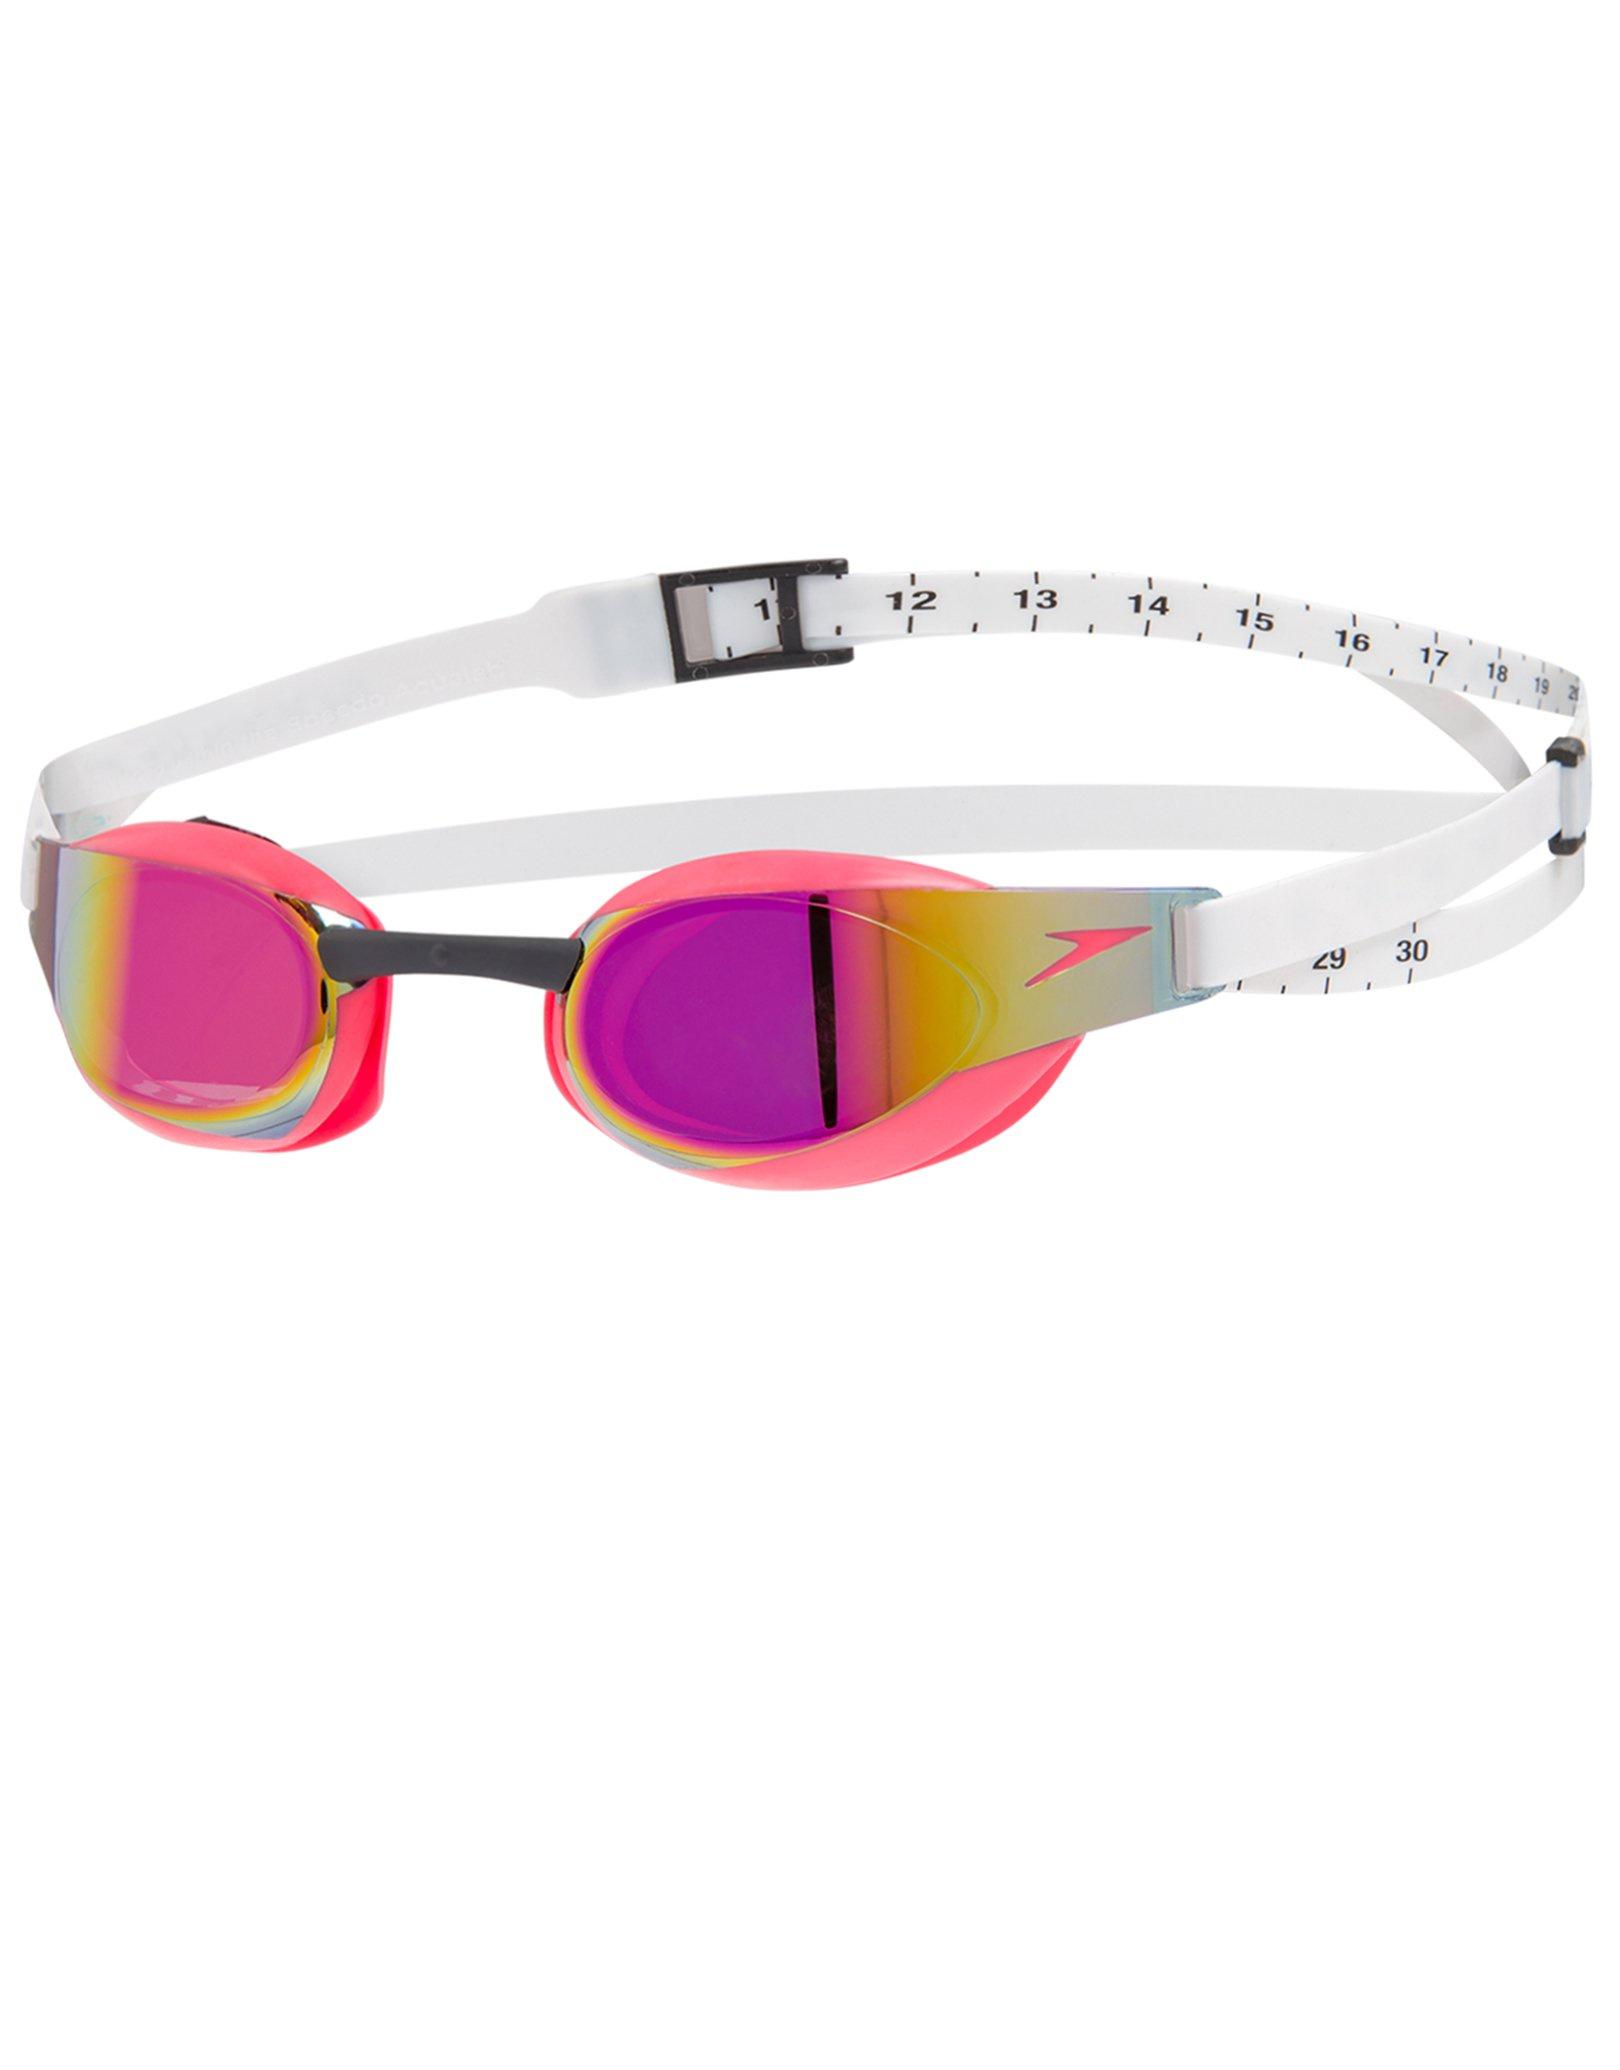 Fastskin Elite Mirror Goggles White/Psycho Red/Red